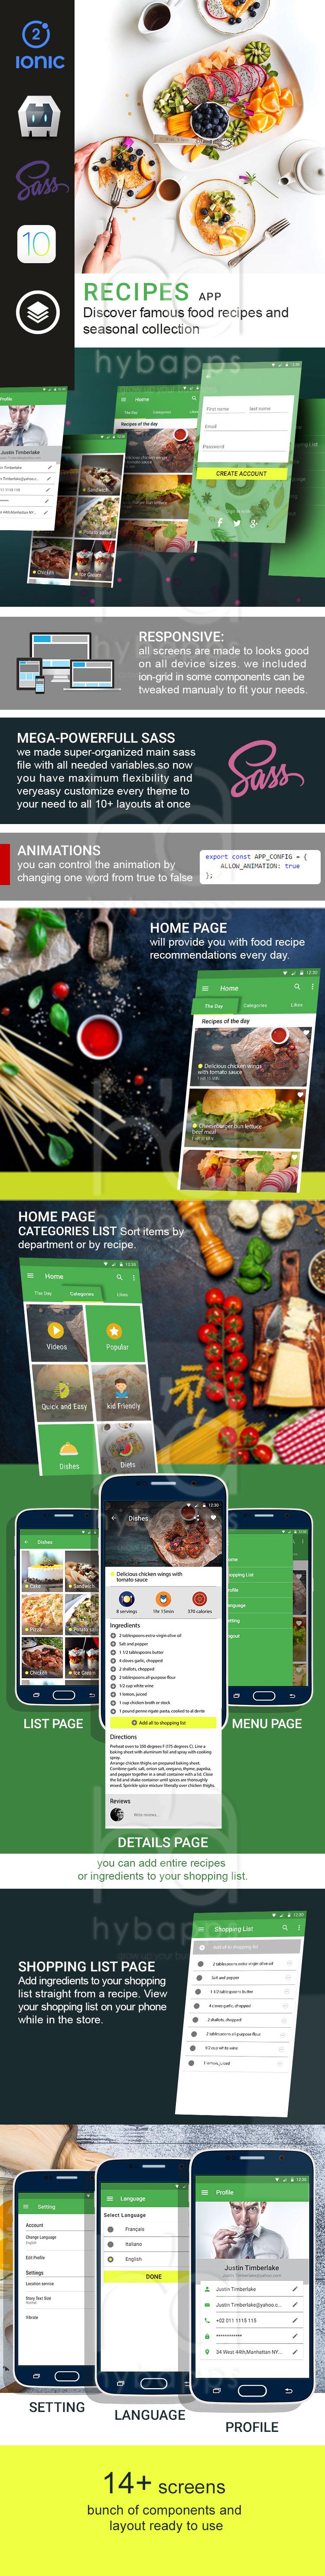 Recipes-ionic app theme